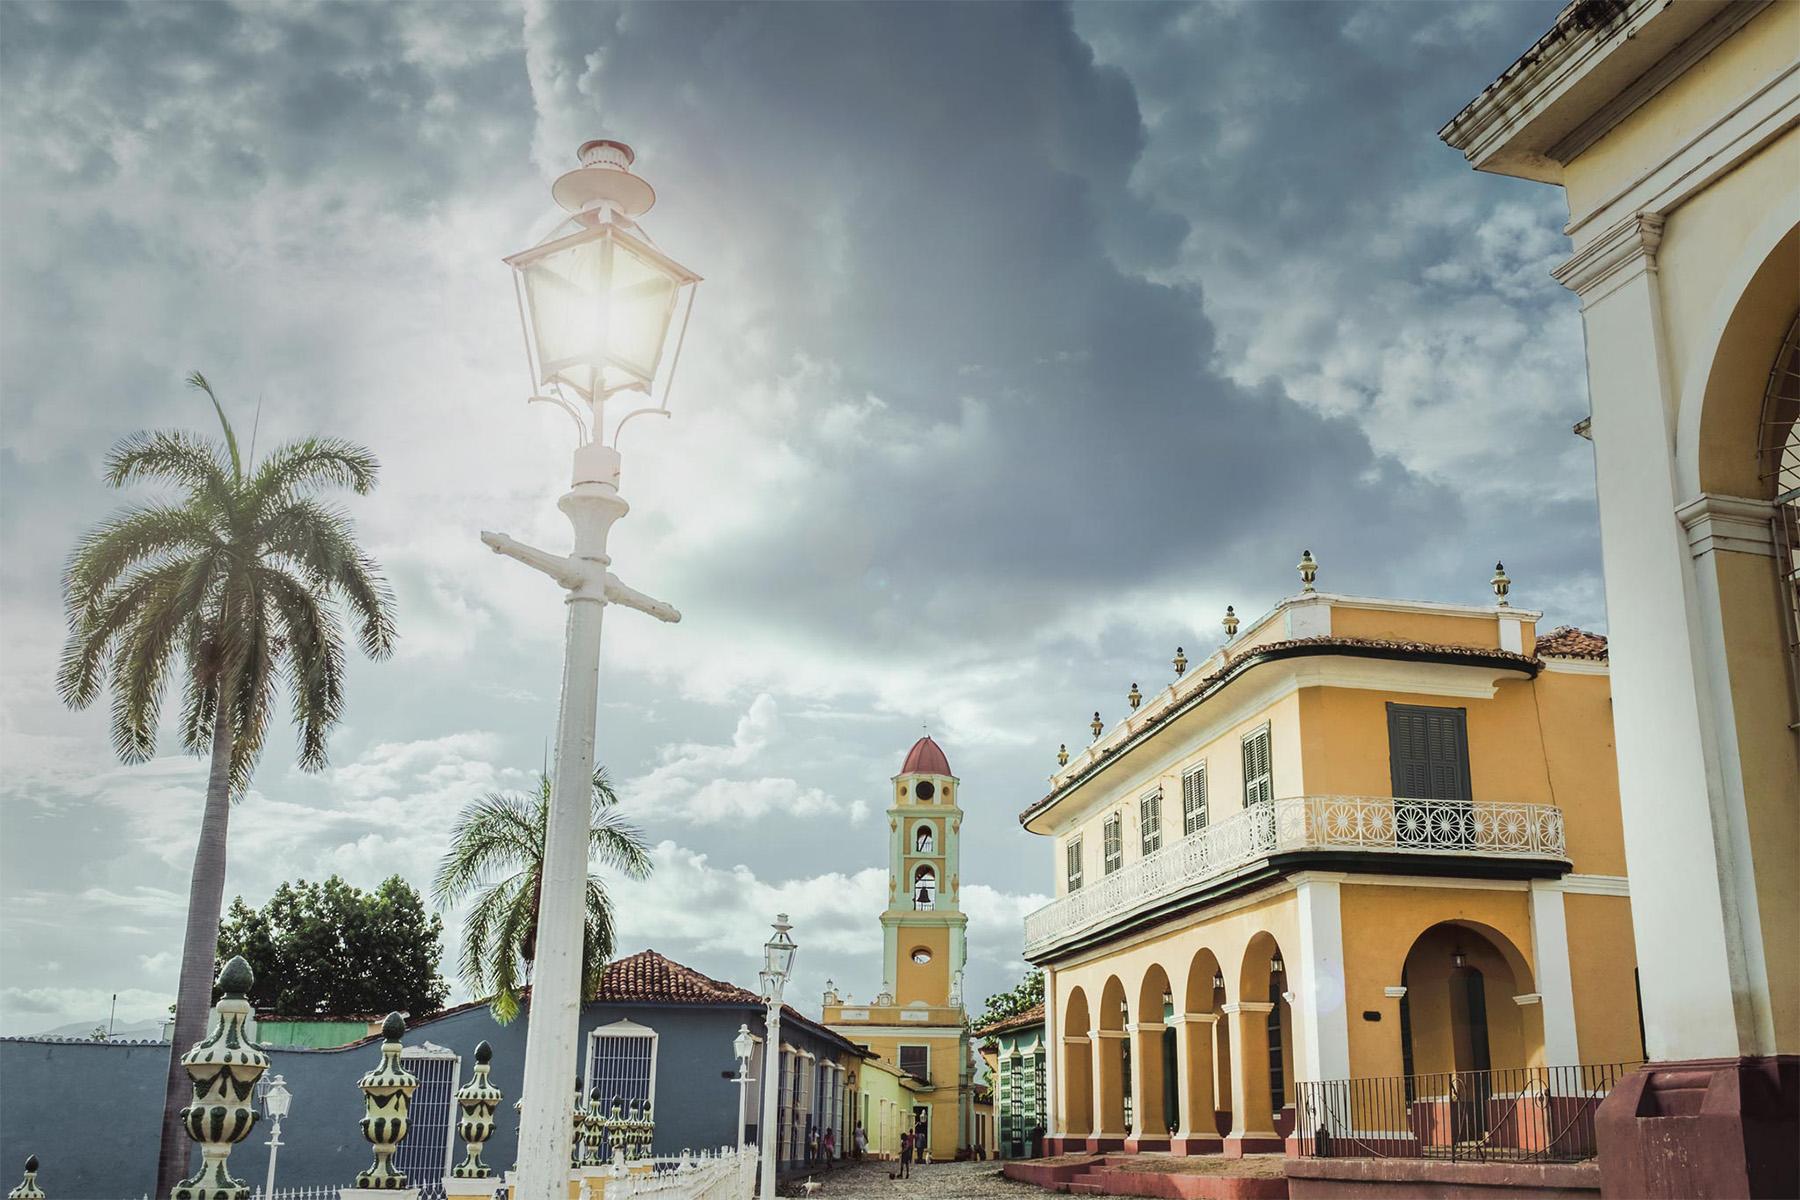 Alejandro_Perez_Travels_Cuba-Central_Trinidad_Plaza.jpg